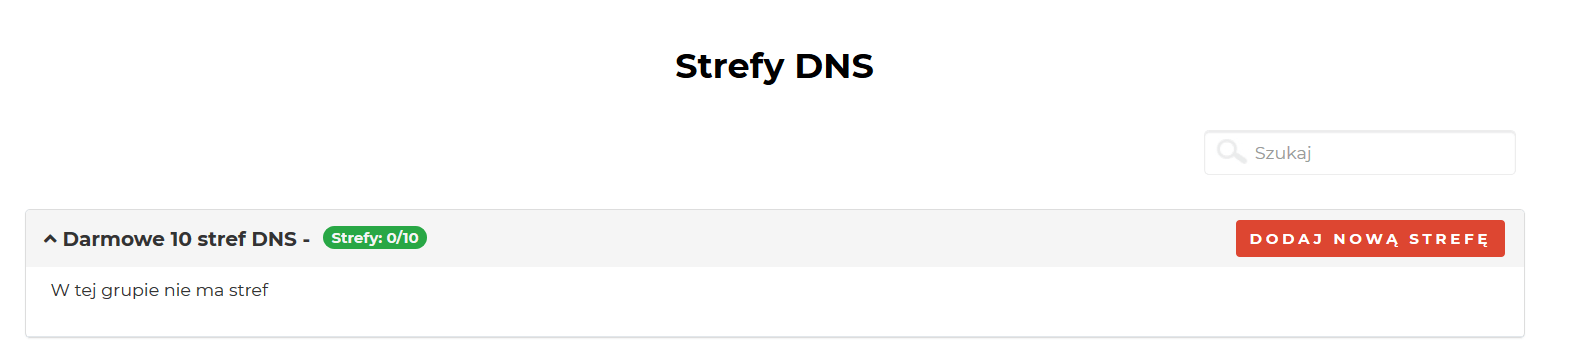 Dodawanie strefy DNS